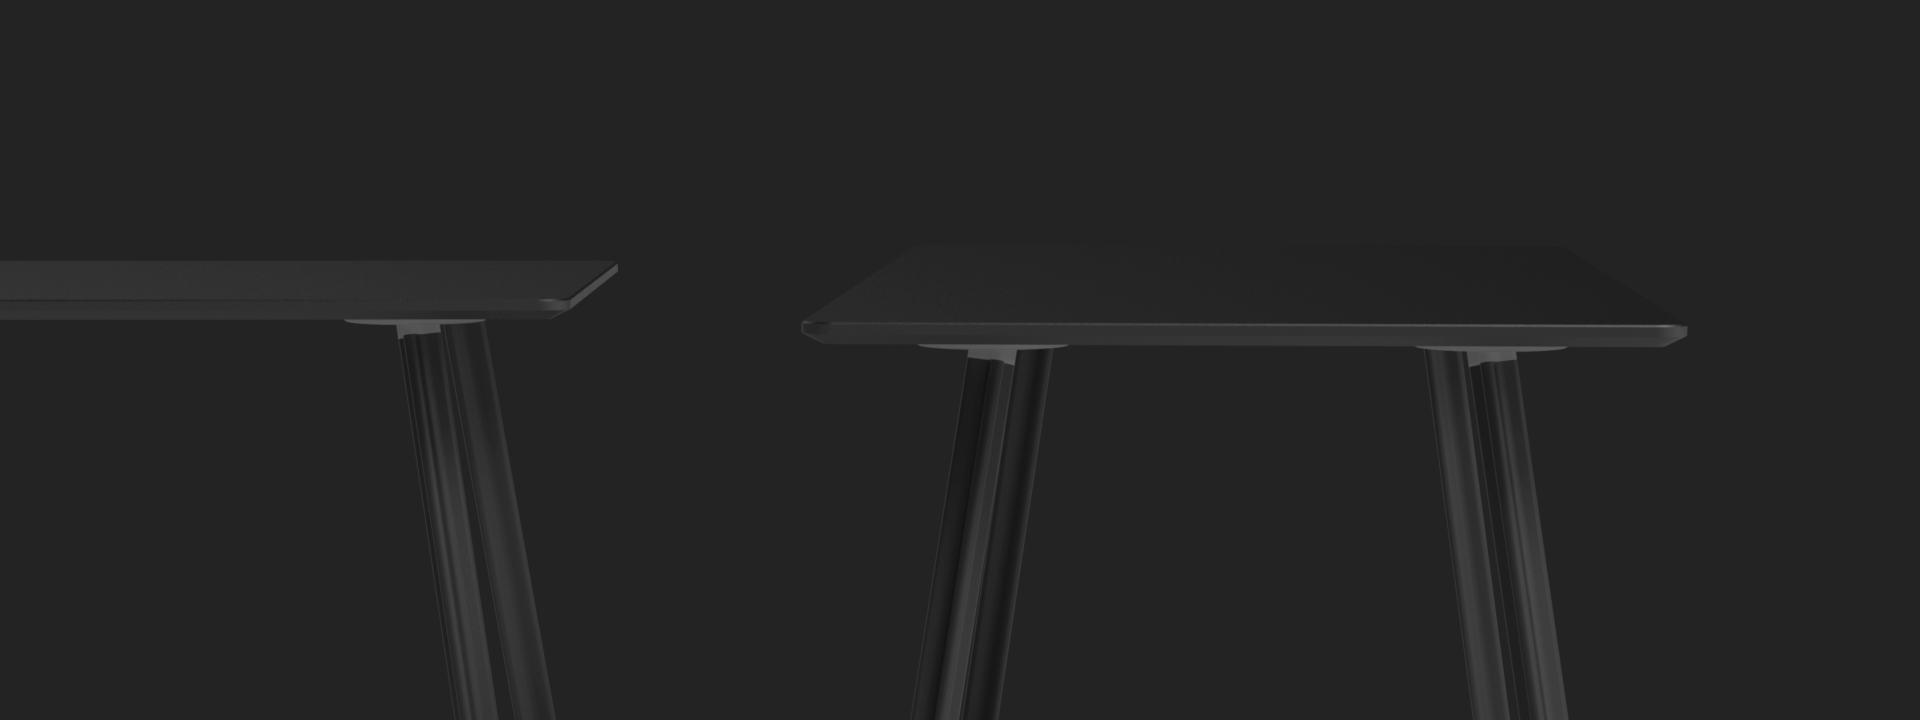 Beam Legs, Tables & Trestles, Table bases, Linoleum Table Top, Table legs